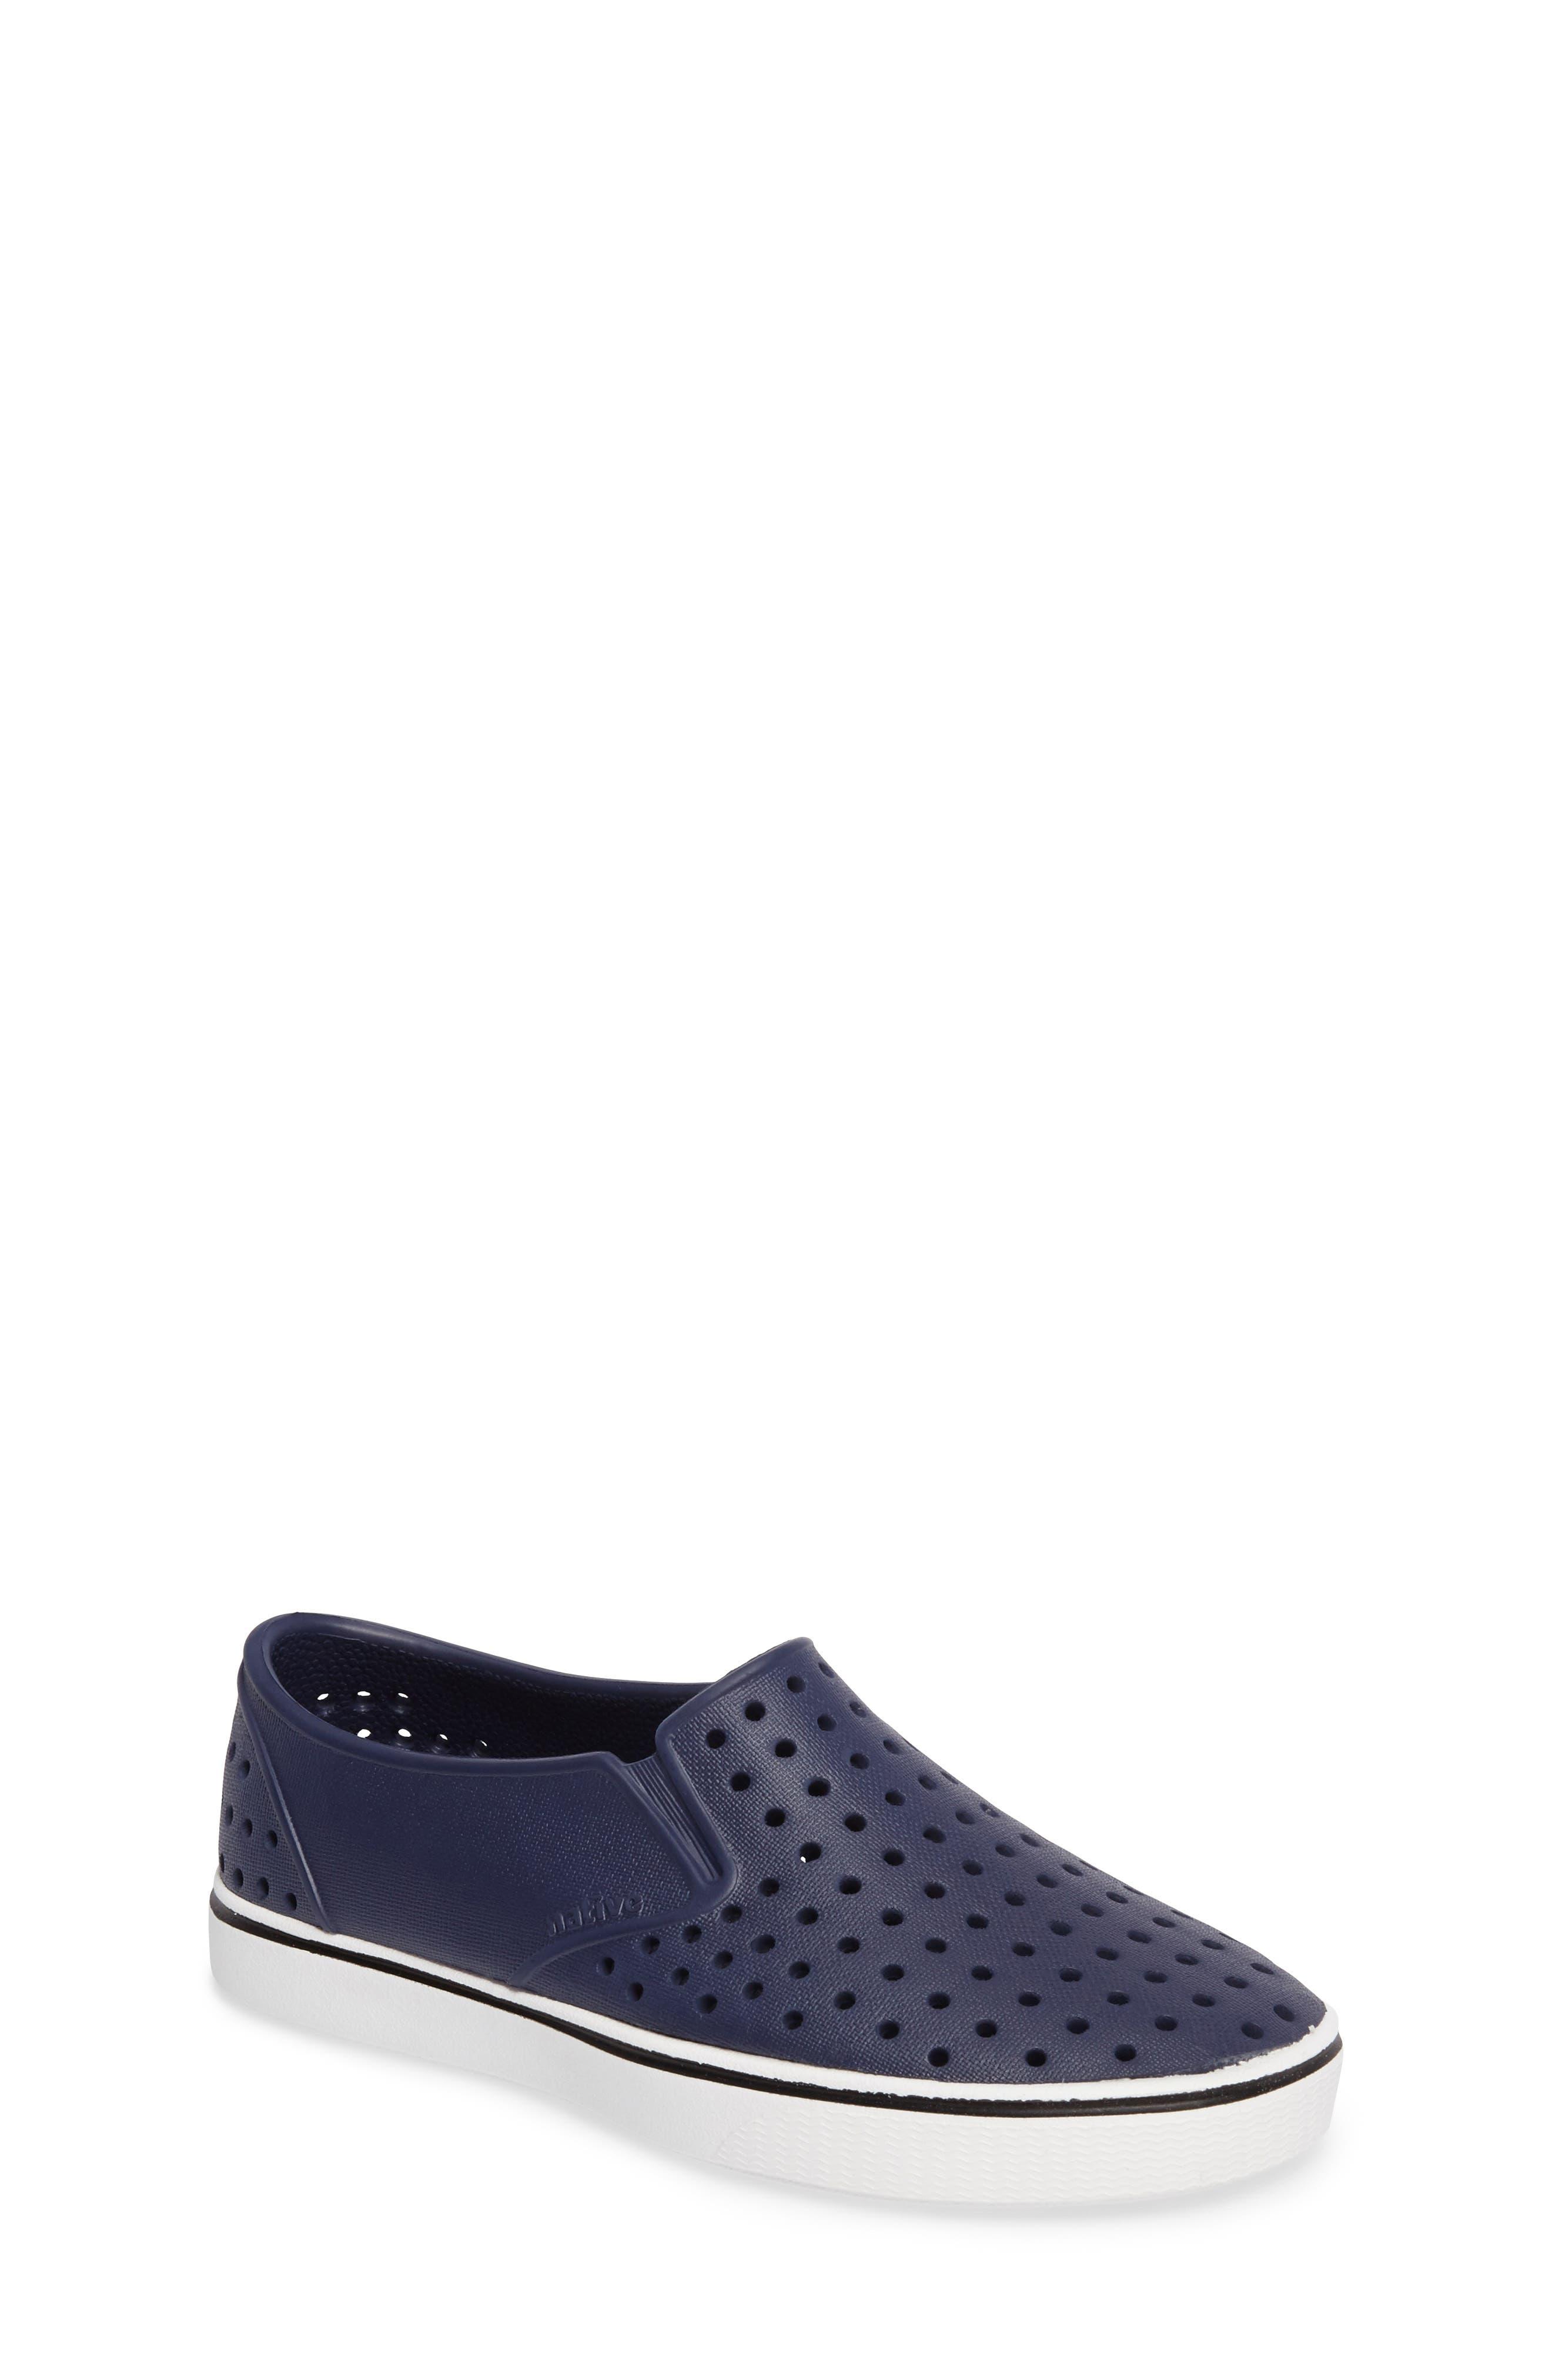 Miles Water Friendly Slip-On Sneaker,                         Main,                         color, Regatta Blue/ Shell White